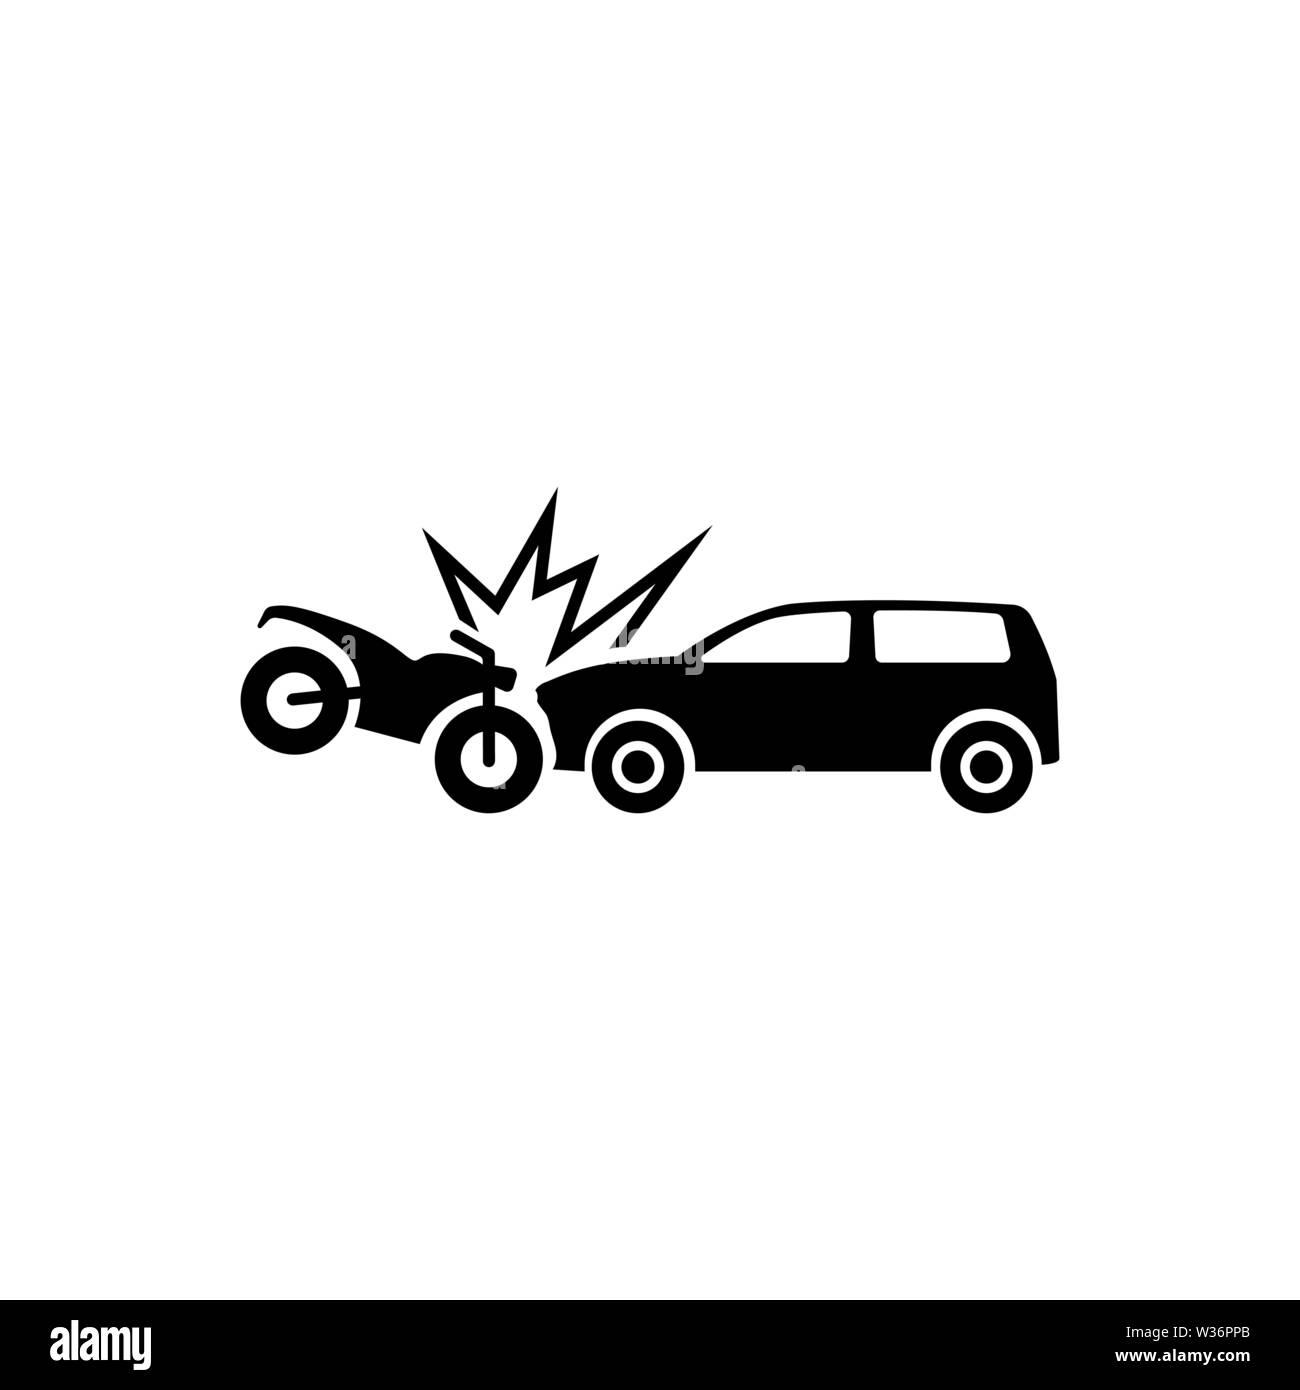 Car Crash Black and White Stock Photos & Images - Alamy